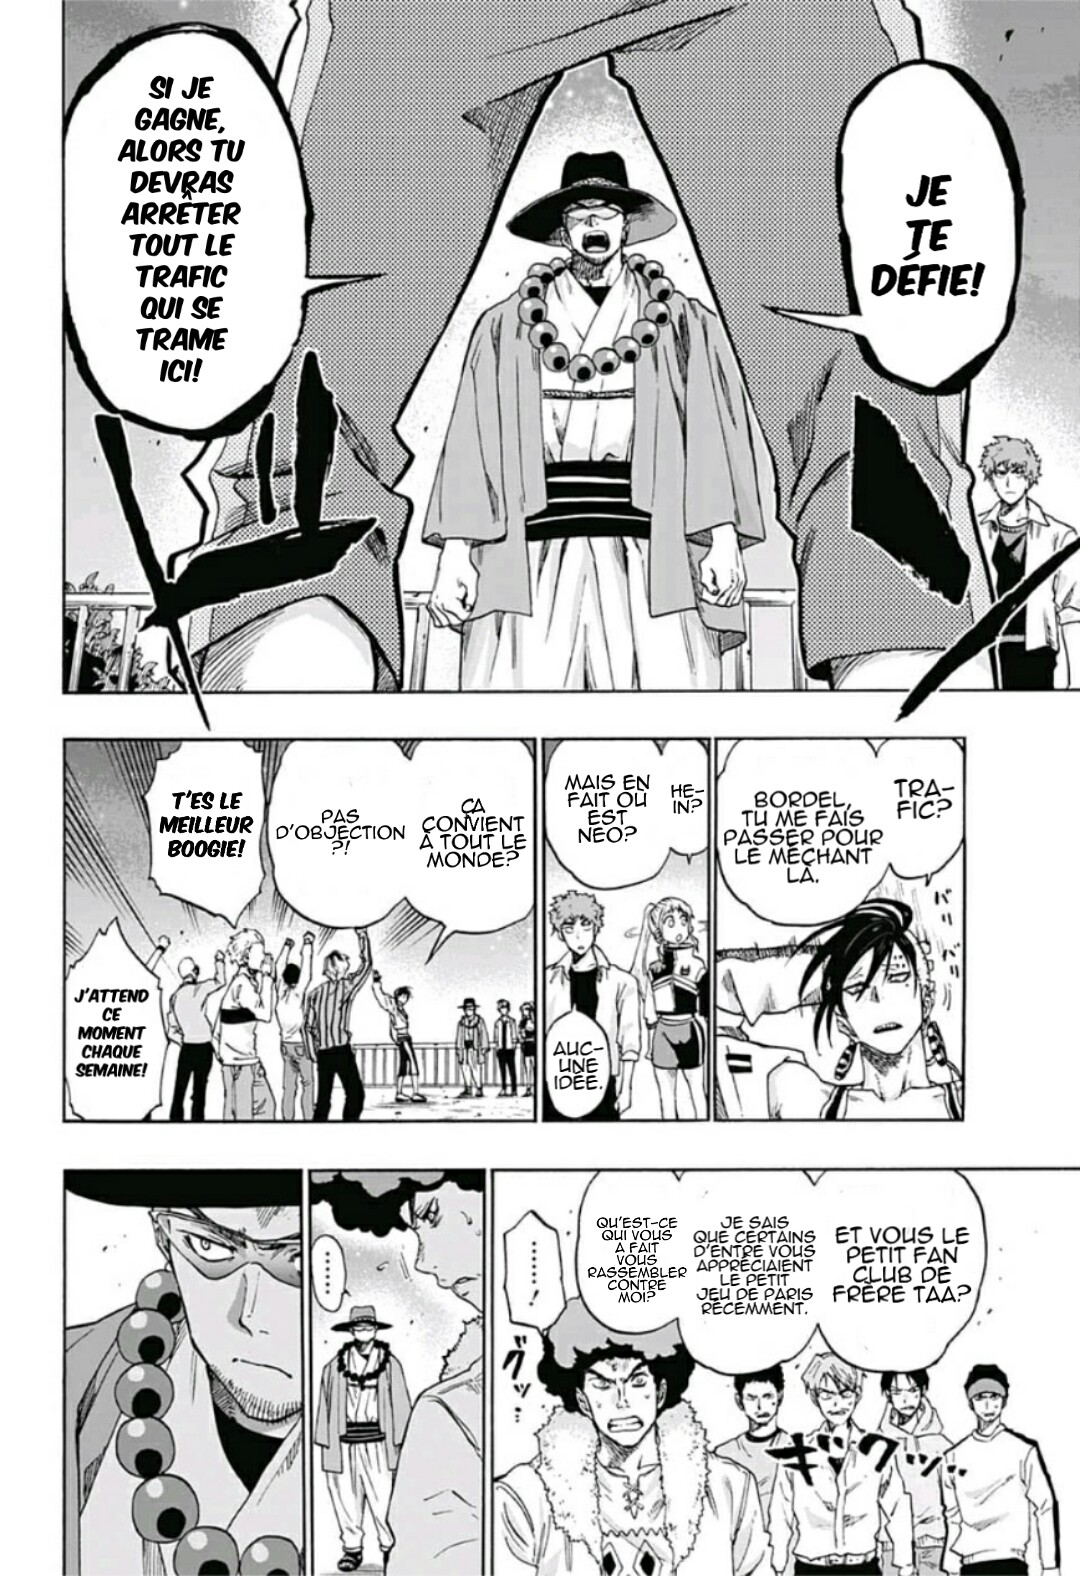 https://nine.mangadogs.com/fr_manga/pic1/41/297/95895/neolationChapitre10_1_448.jpg Page 2